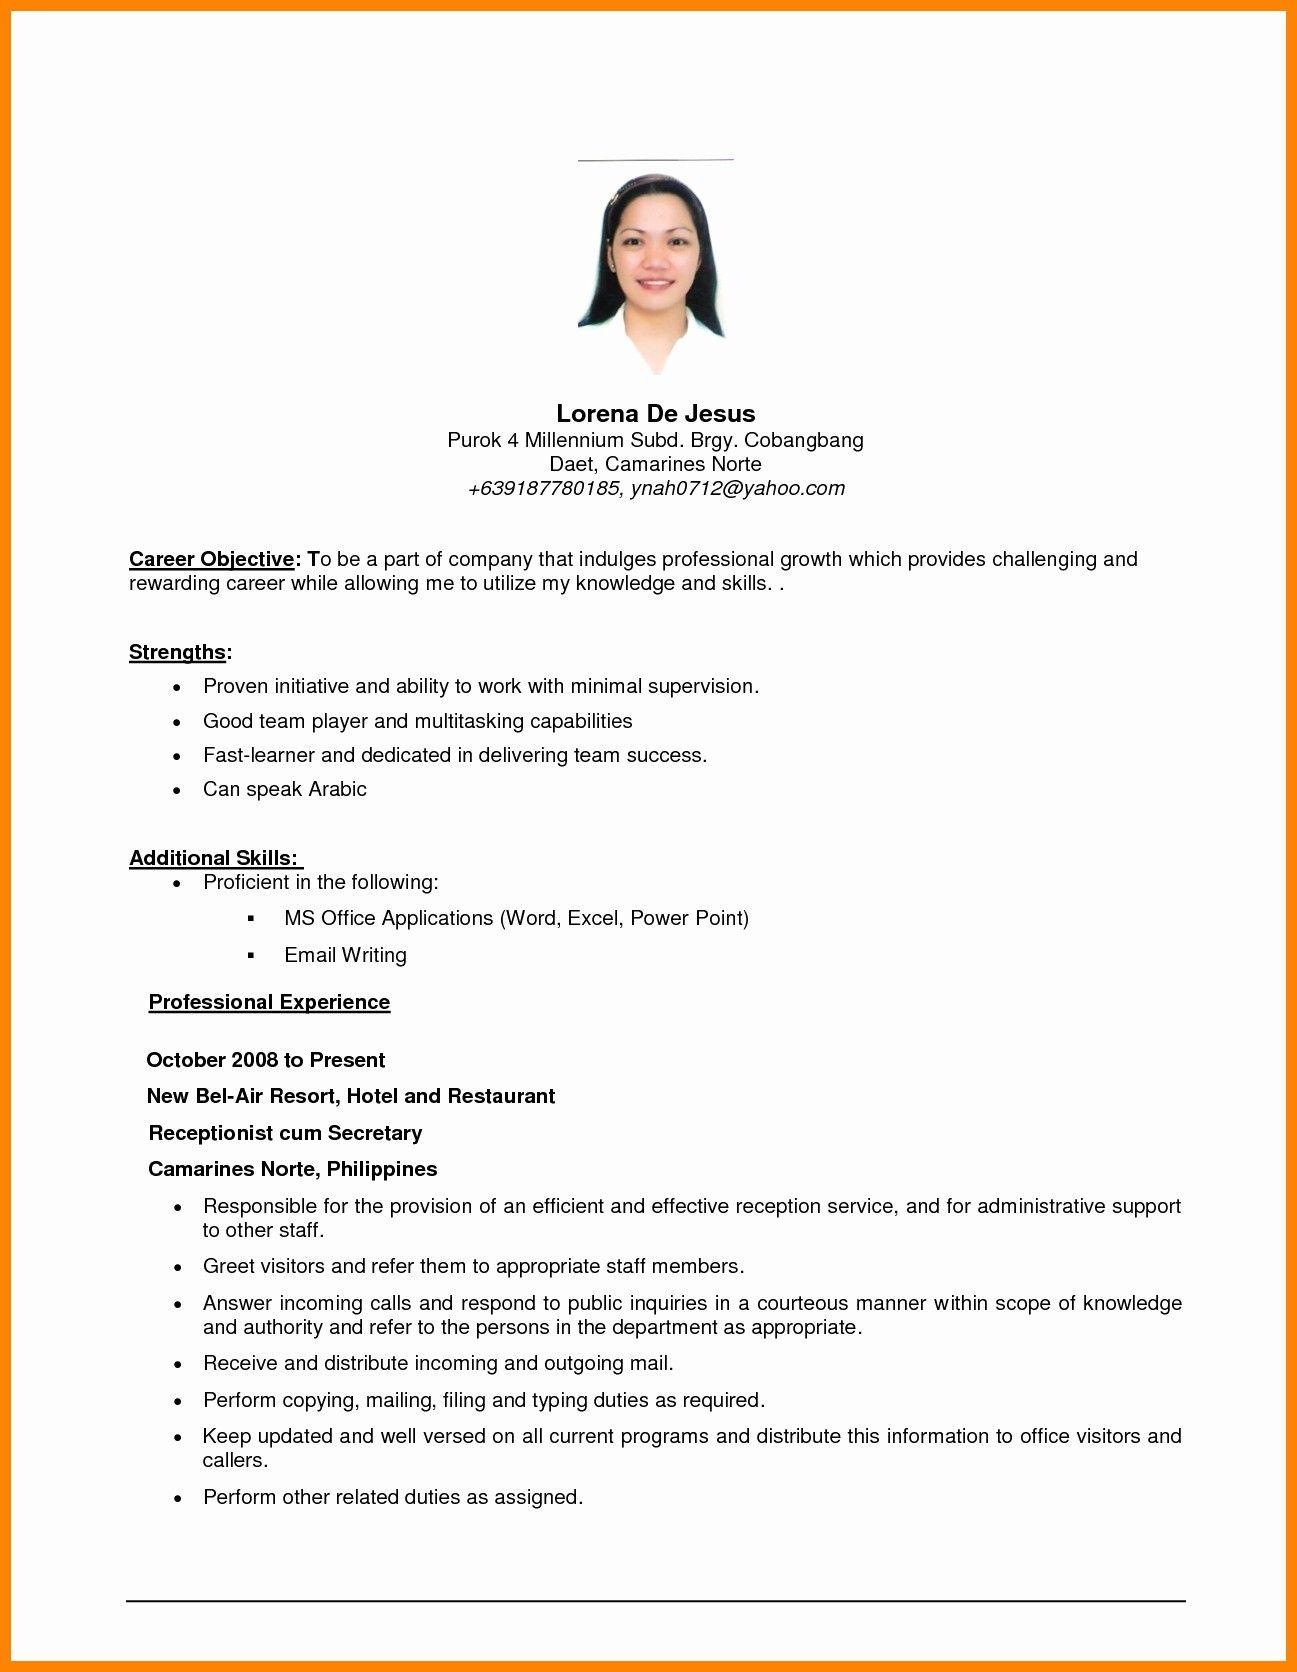 resume template beginner Professional in 2020 Job resume